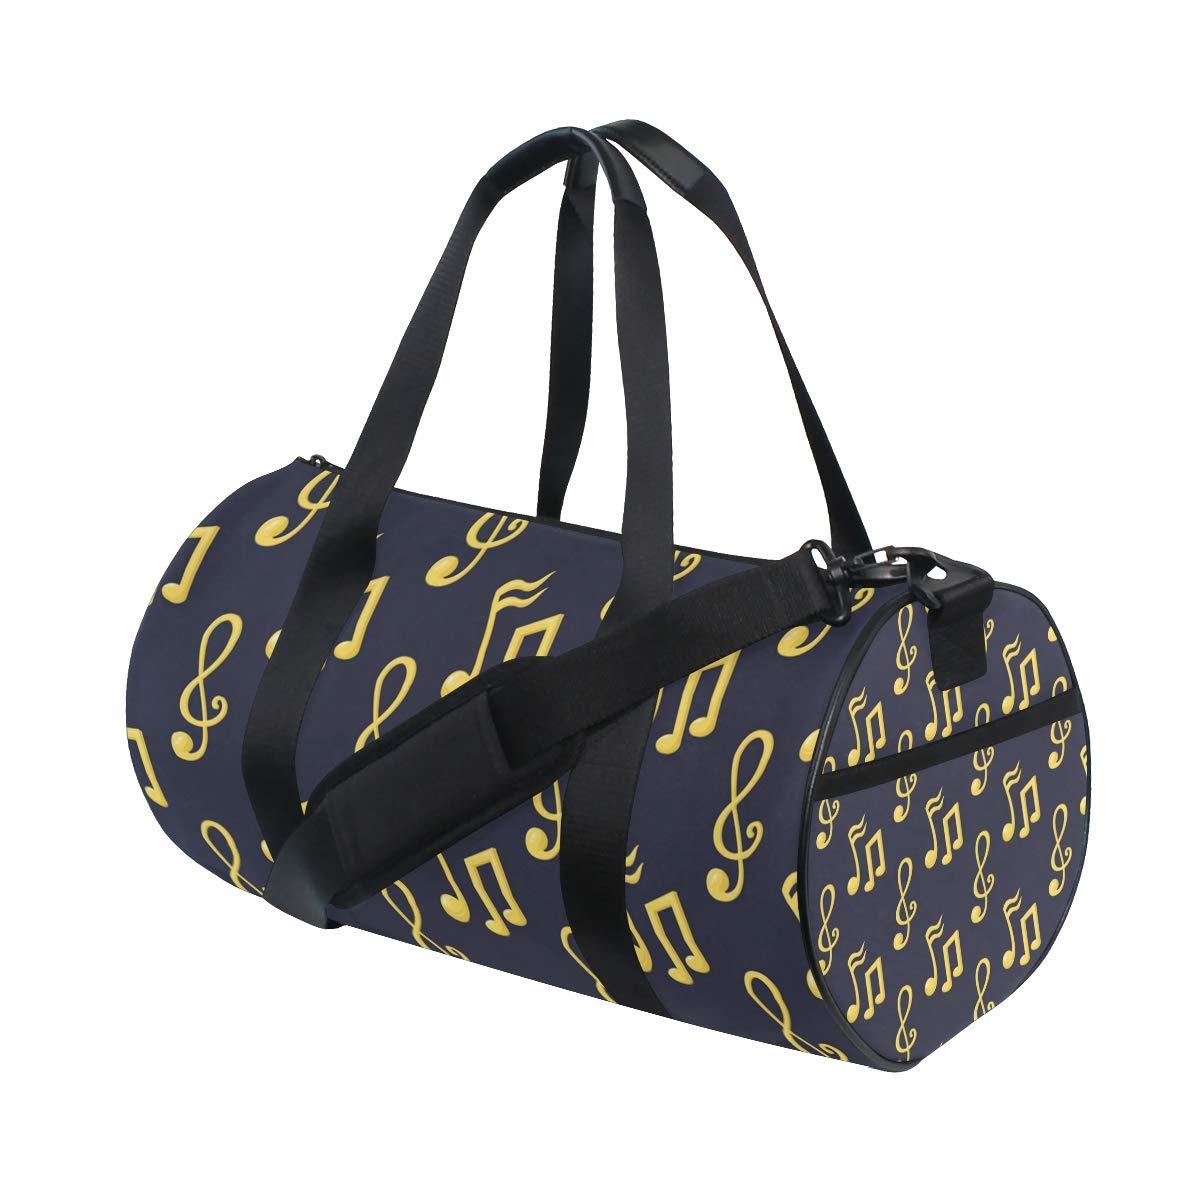 Shar Music ImageWaterproof Non-Slip Wearable Crossbody Bag fitness bag Shoulder Bag